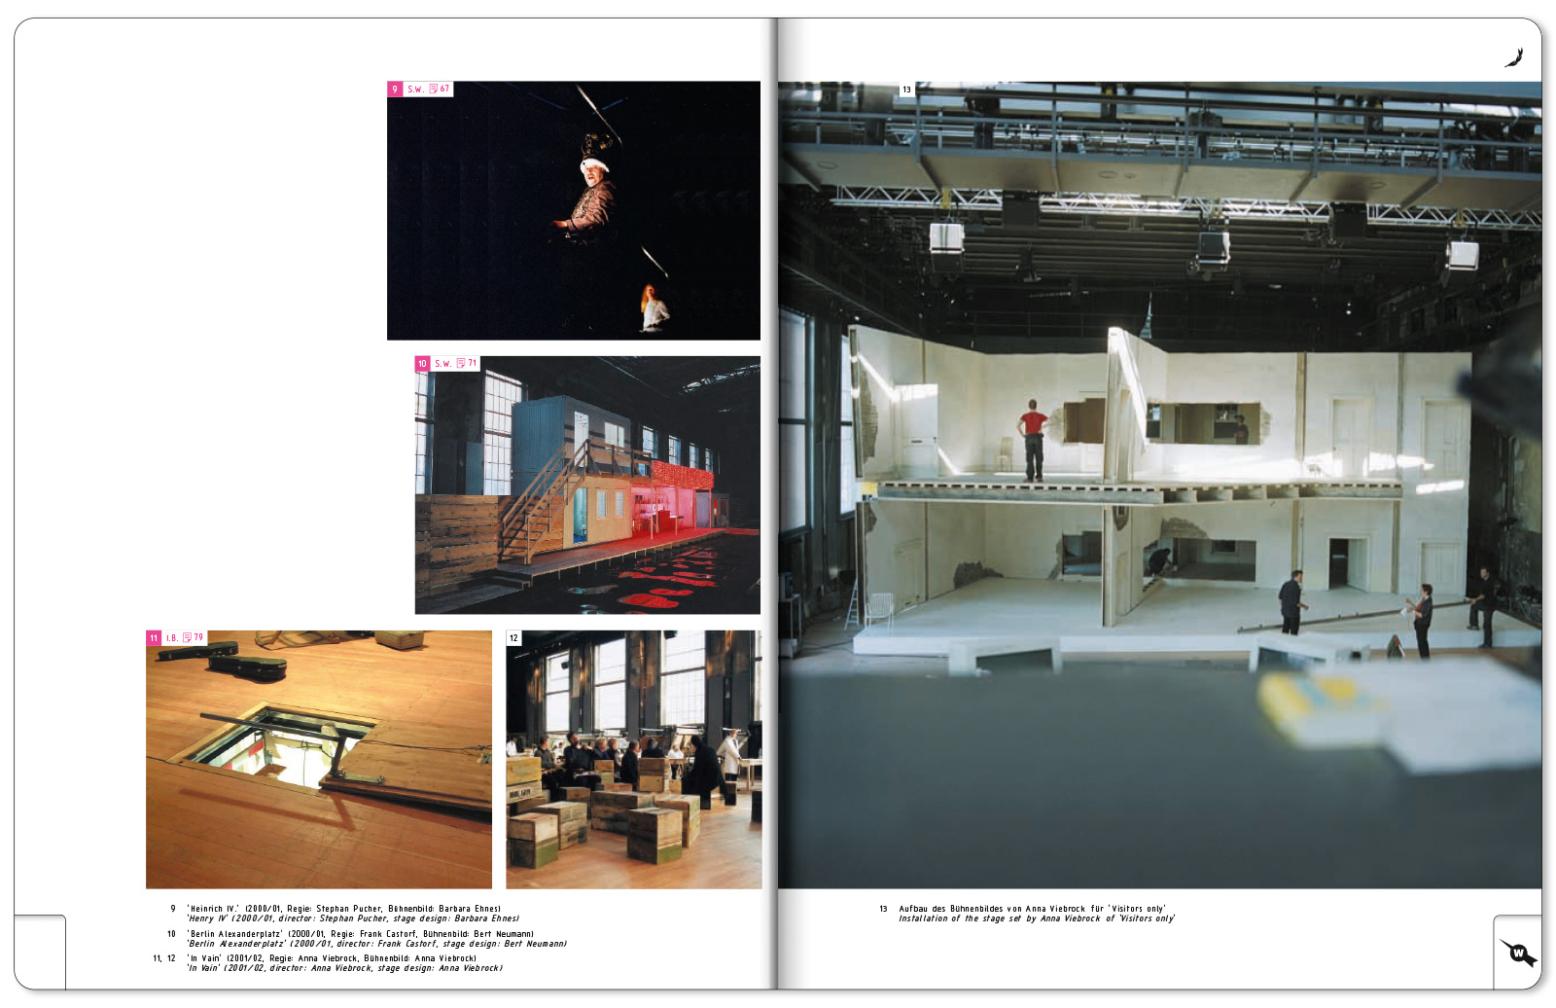 schiffbau_spread_theater_02_1600px_web